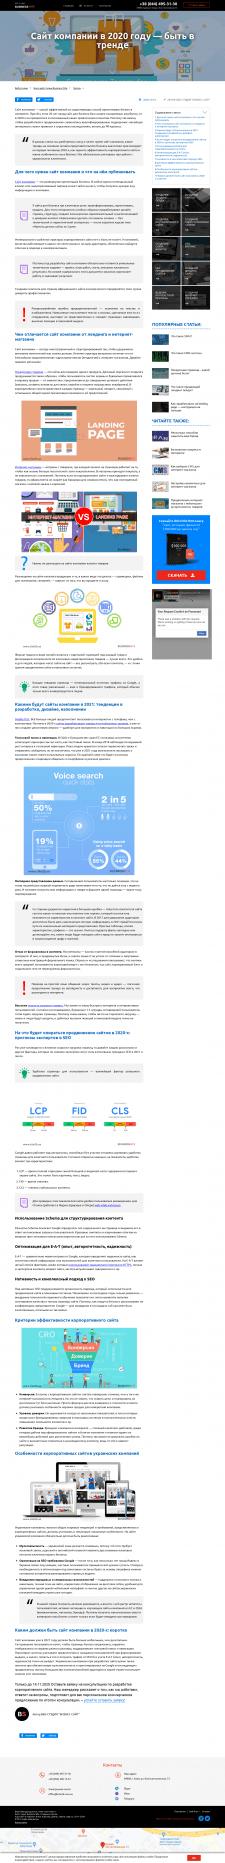 Статья о трендах 2020-х для корпоративных сайтов